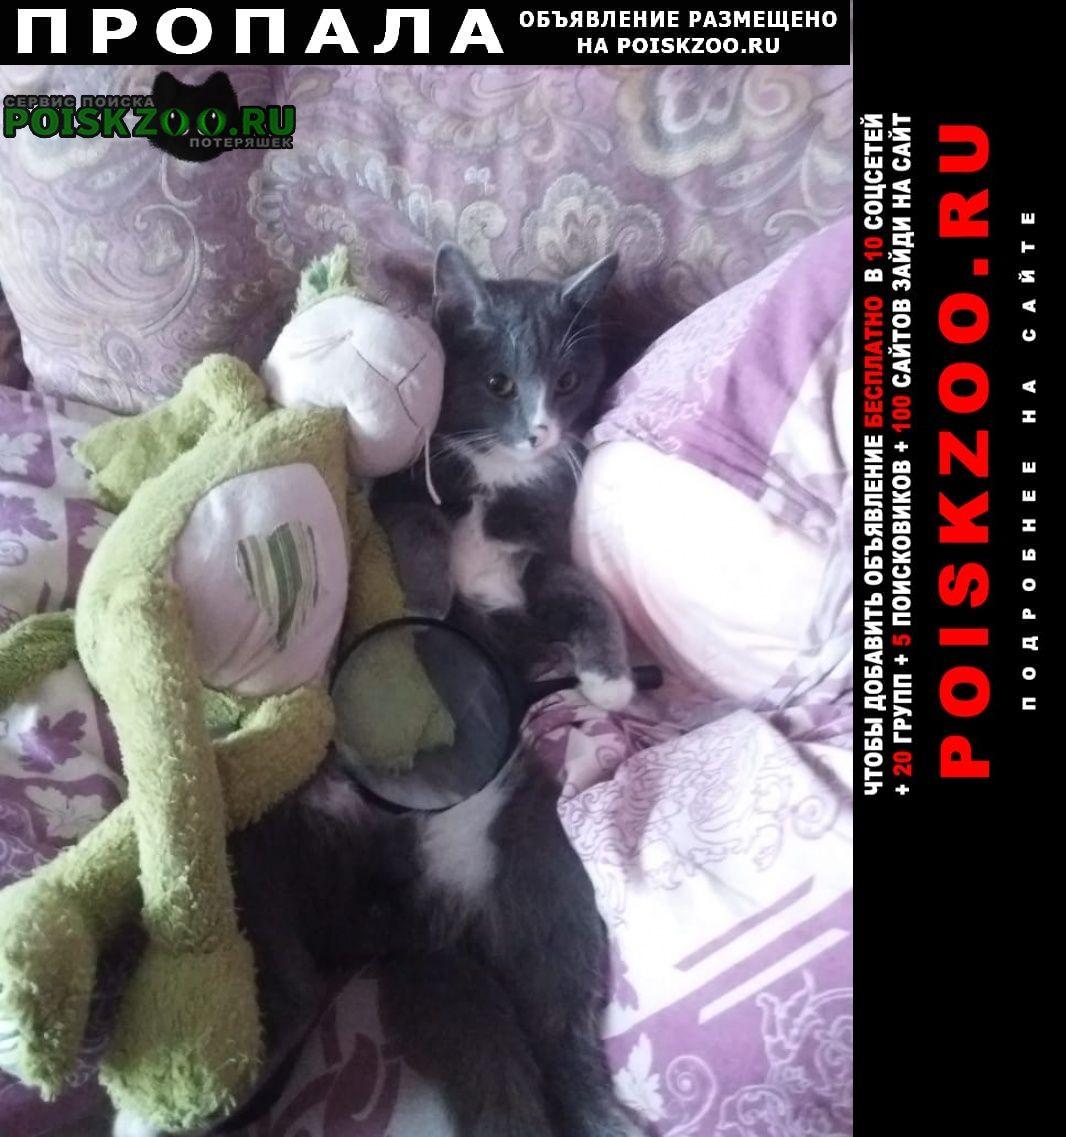 Пропала кошка кот. Омск